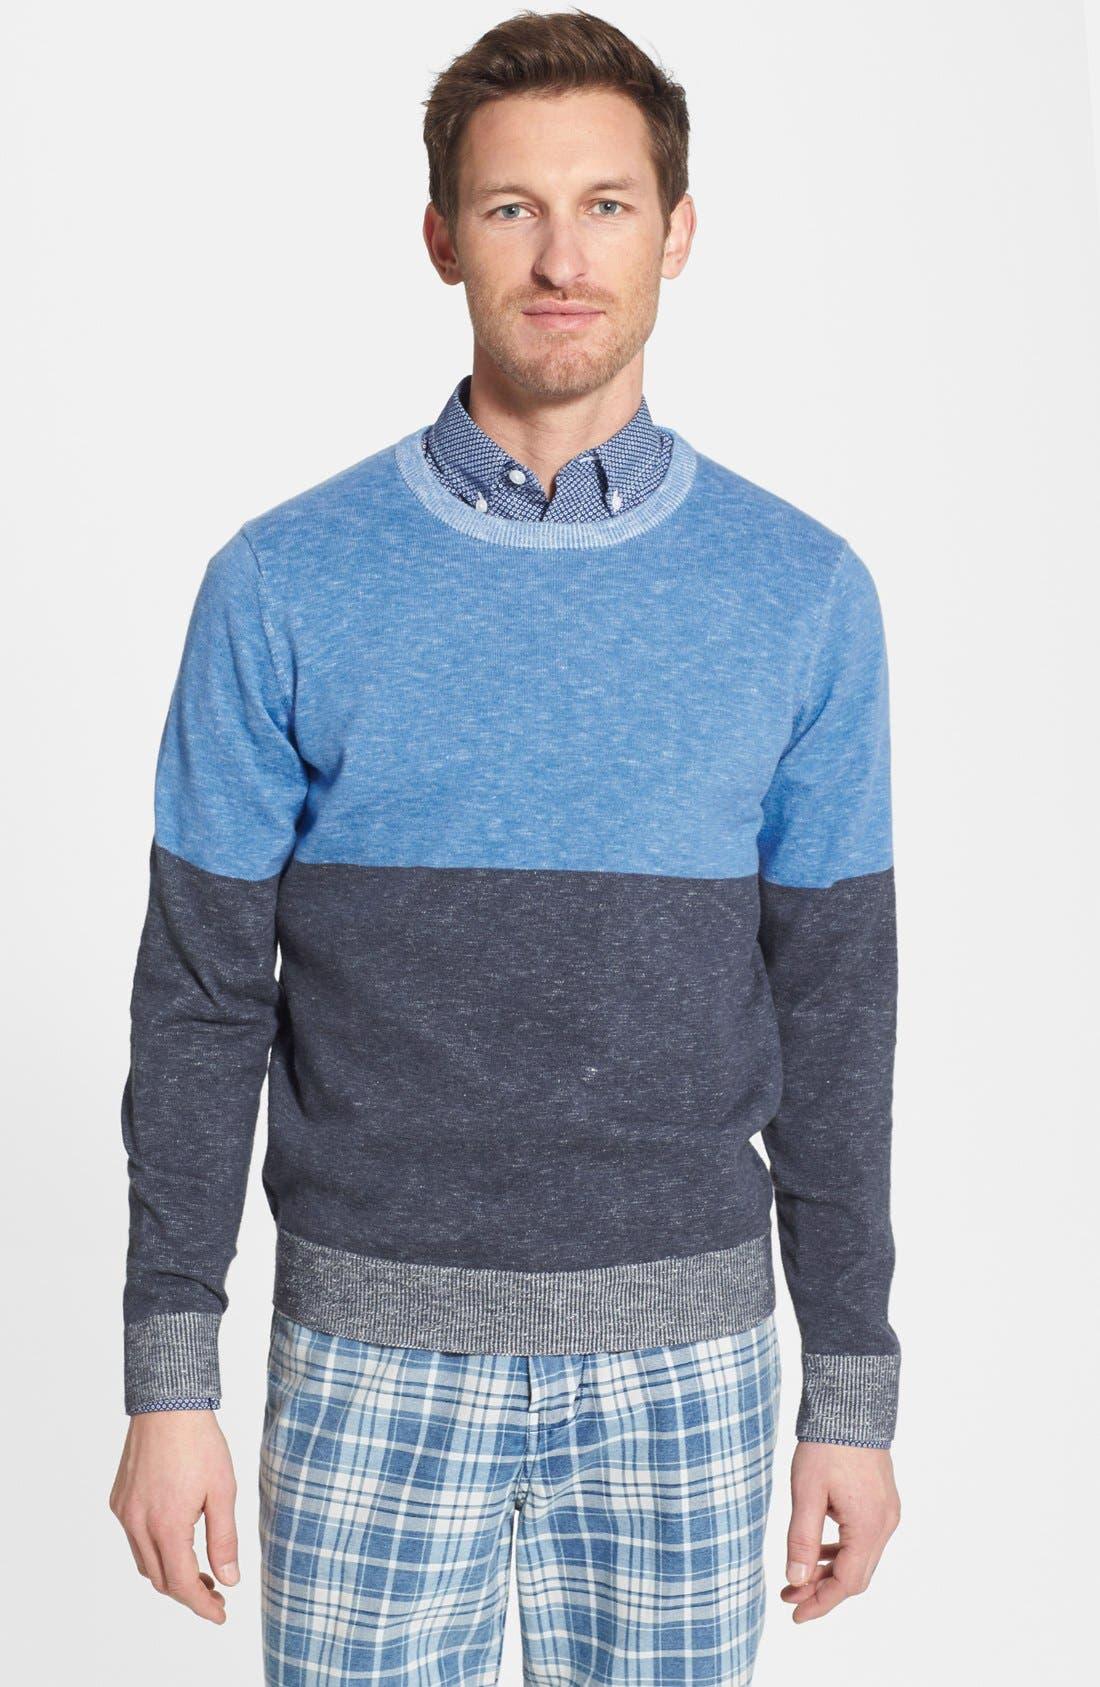 Main Image - Grayers 'Onlan' Colorblock Trim Fit Crewneck Sweater